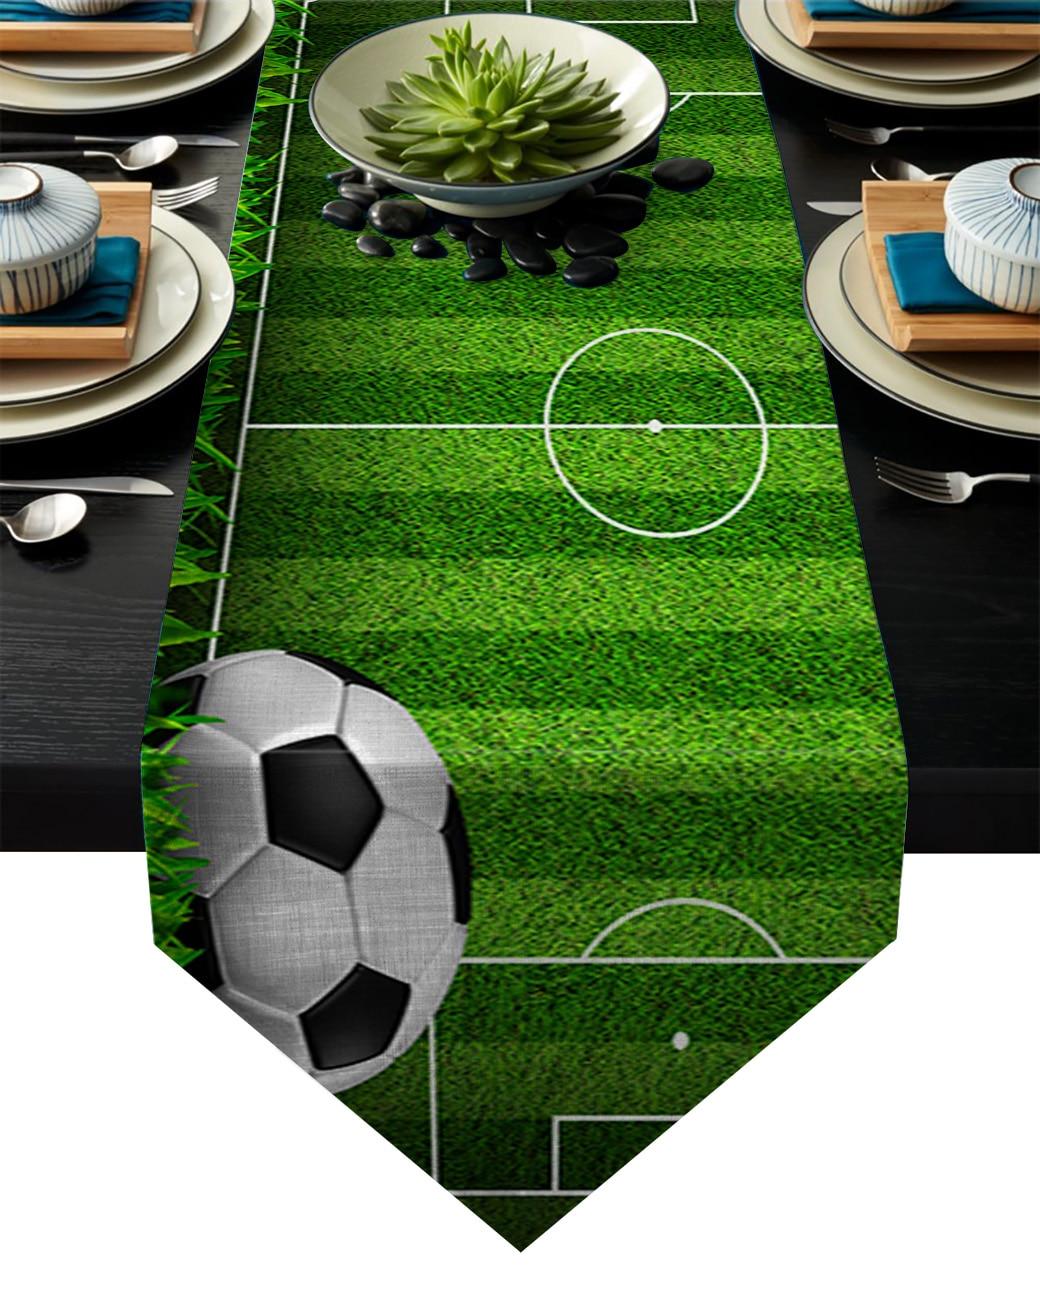 FOOTBALL THEME PARTY TABLECLOTH 120 x 180CM